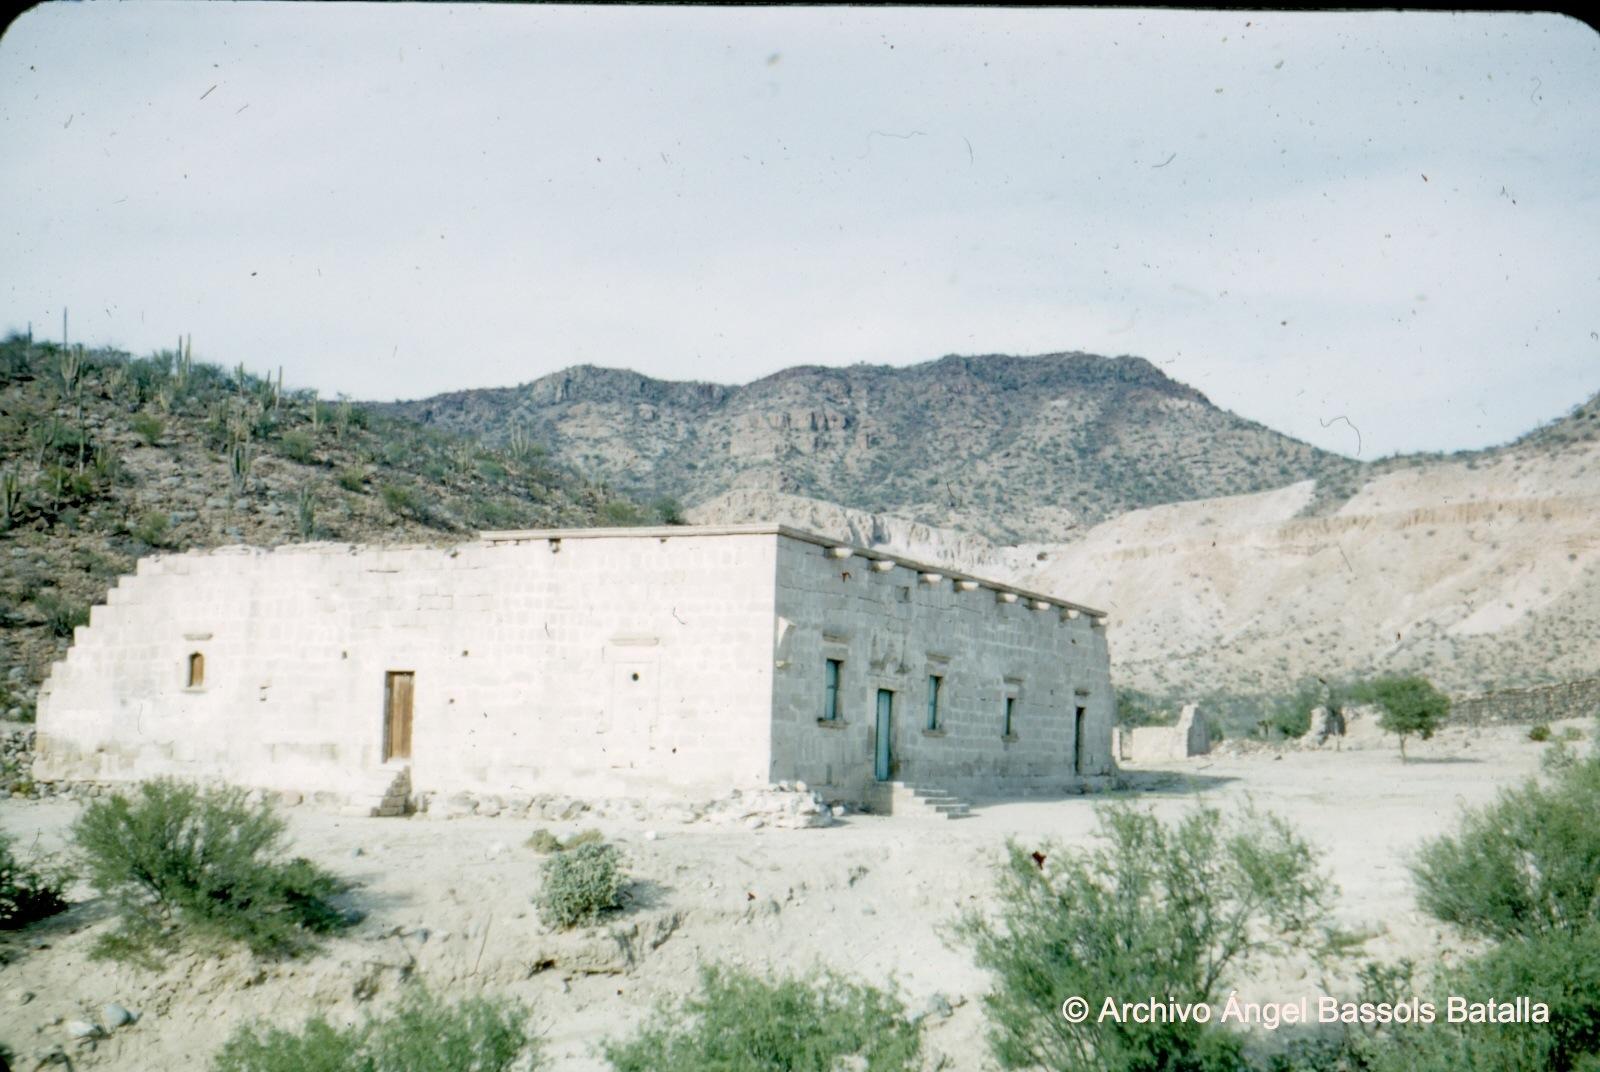 Misión Santa Gertrudris